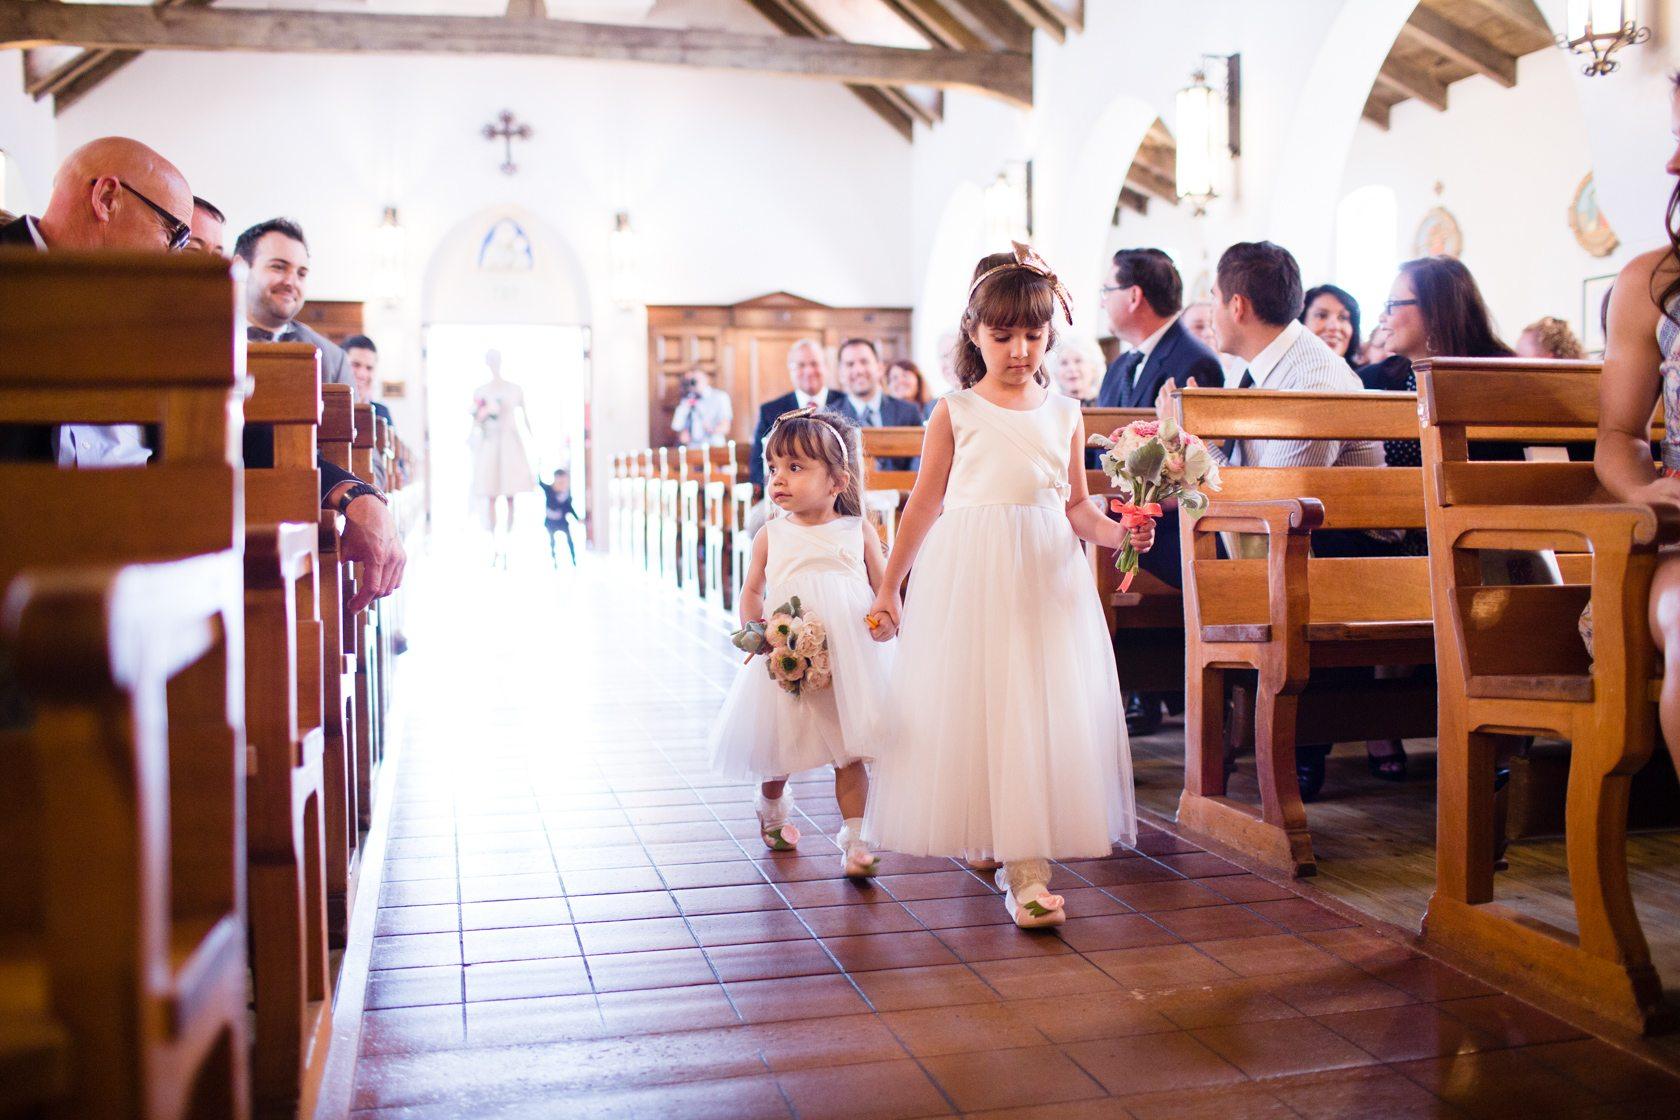 Darlington_House_Wedding_053.jpg